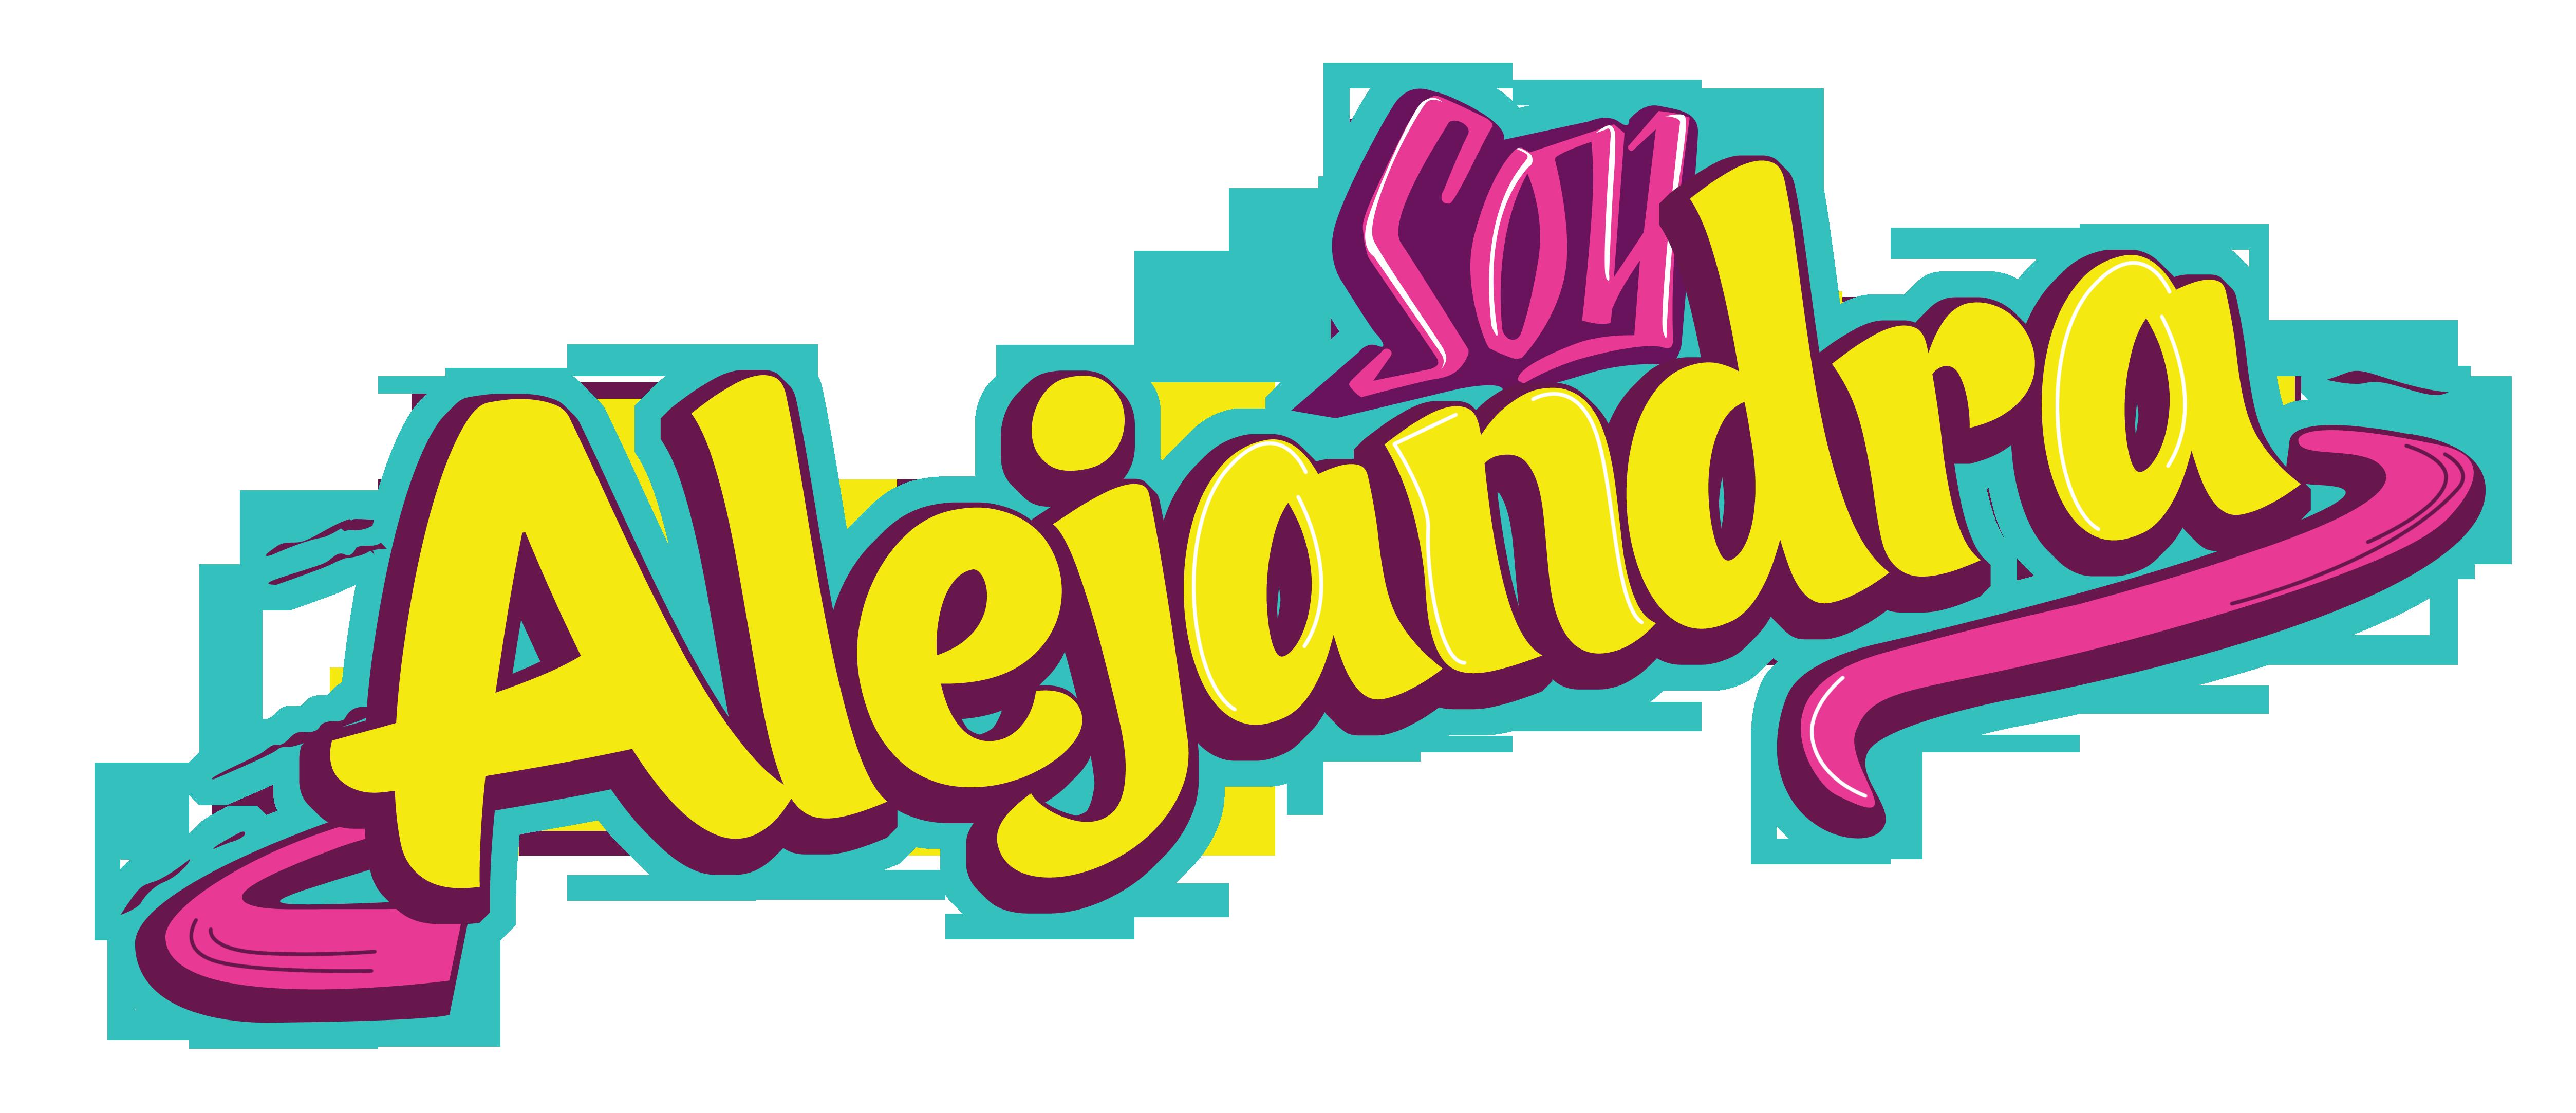 Logo personalizado de soy. Fiesta clipart fiesta word